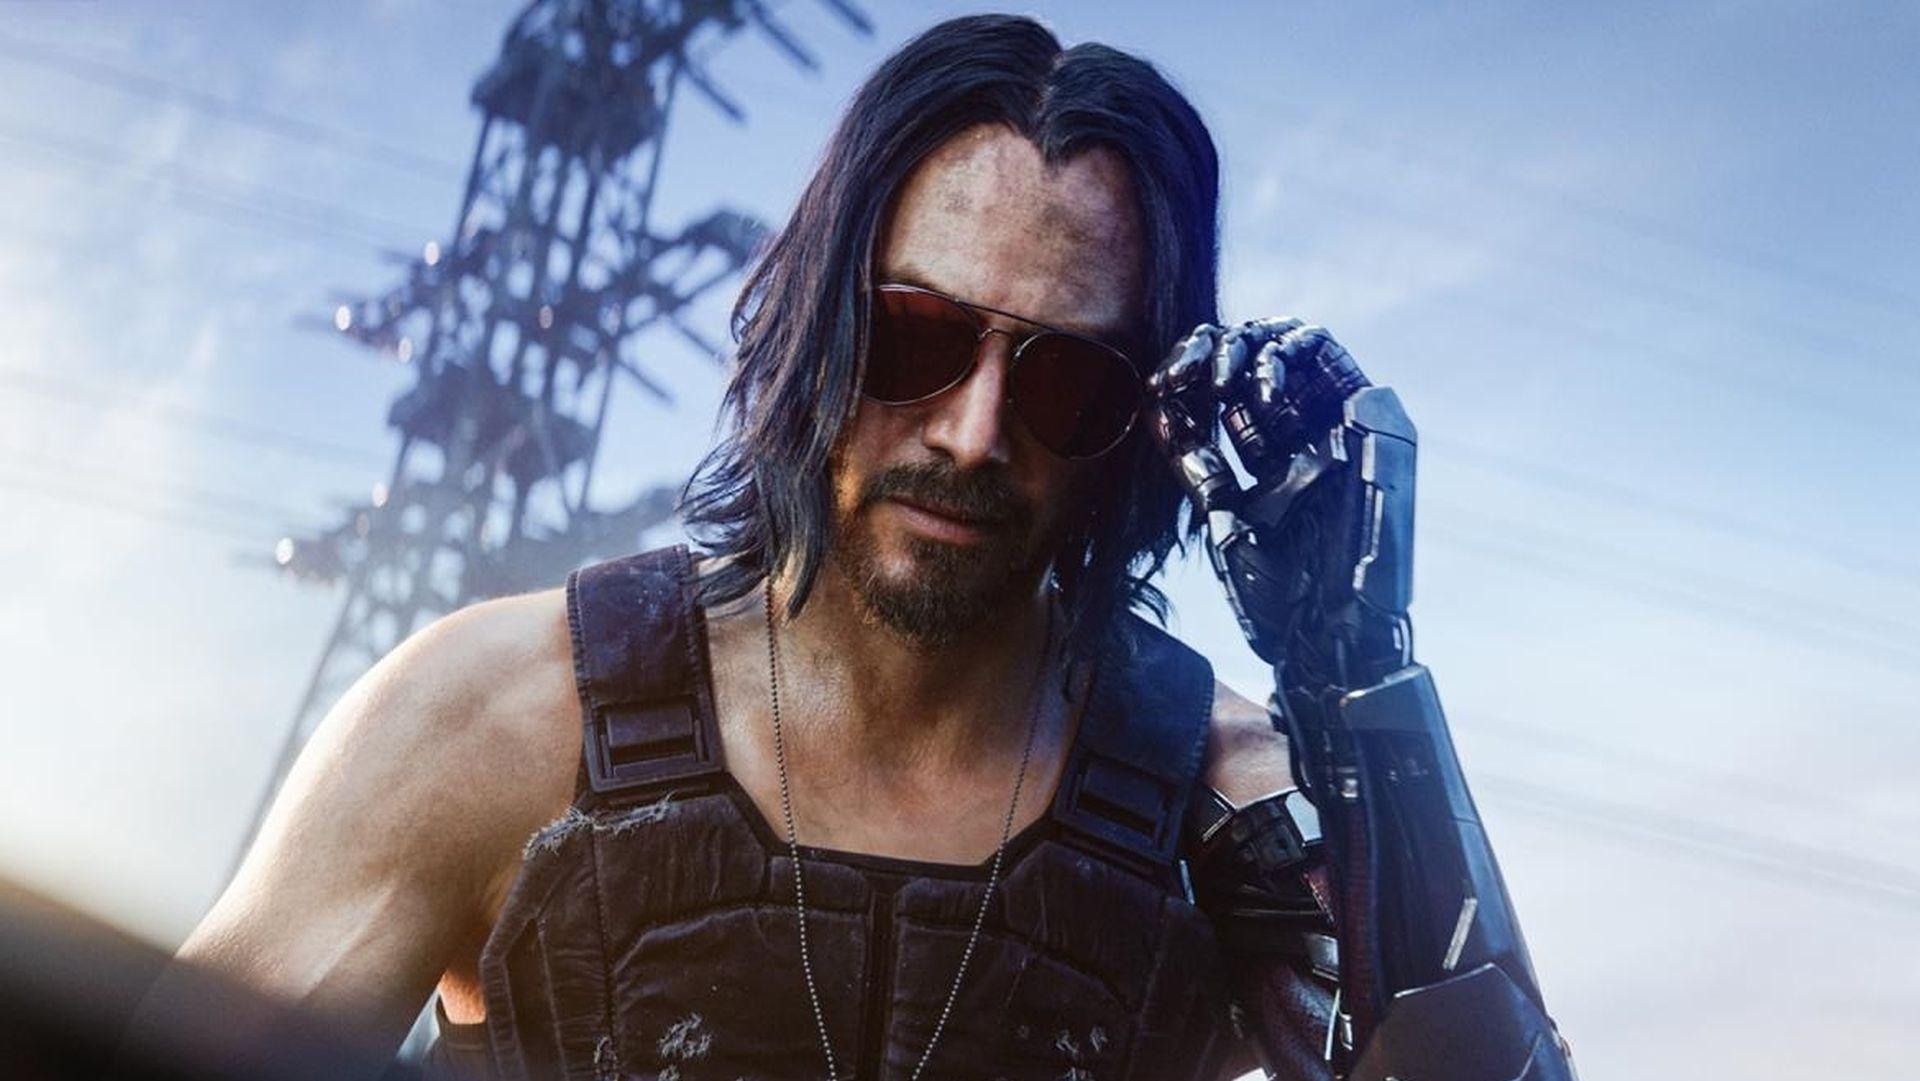 Cyberpunk 2077 announces Keanu Reeves as a main character